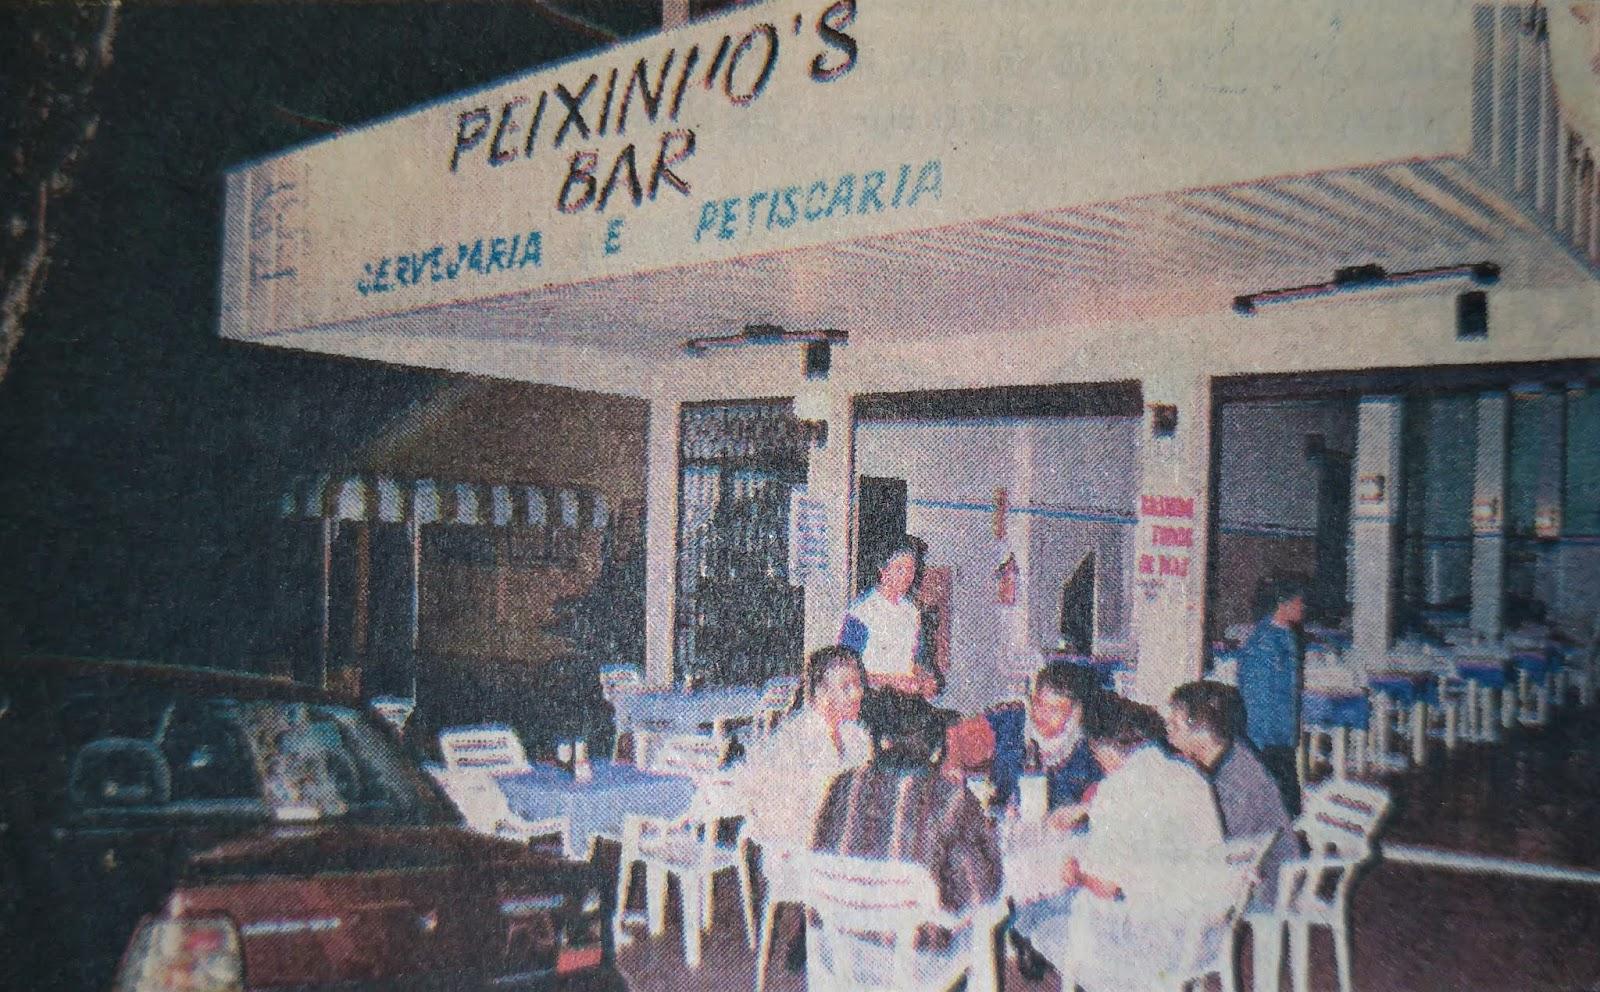 Peixinho's Bar - 1997